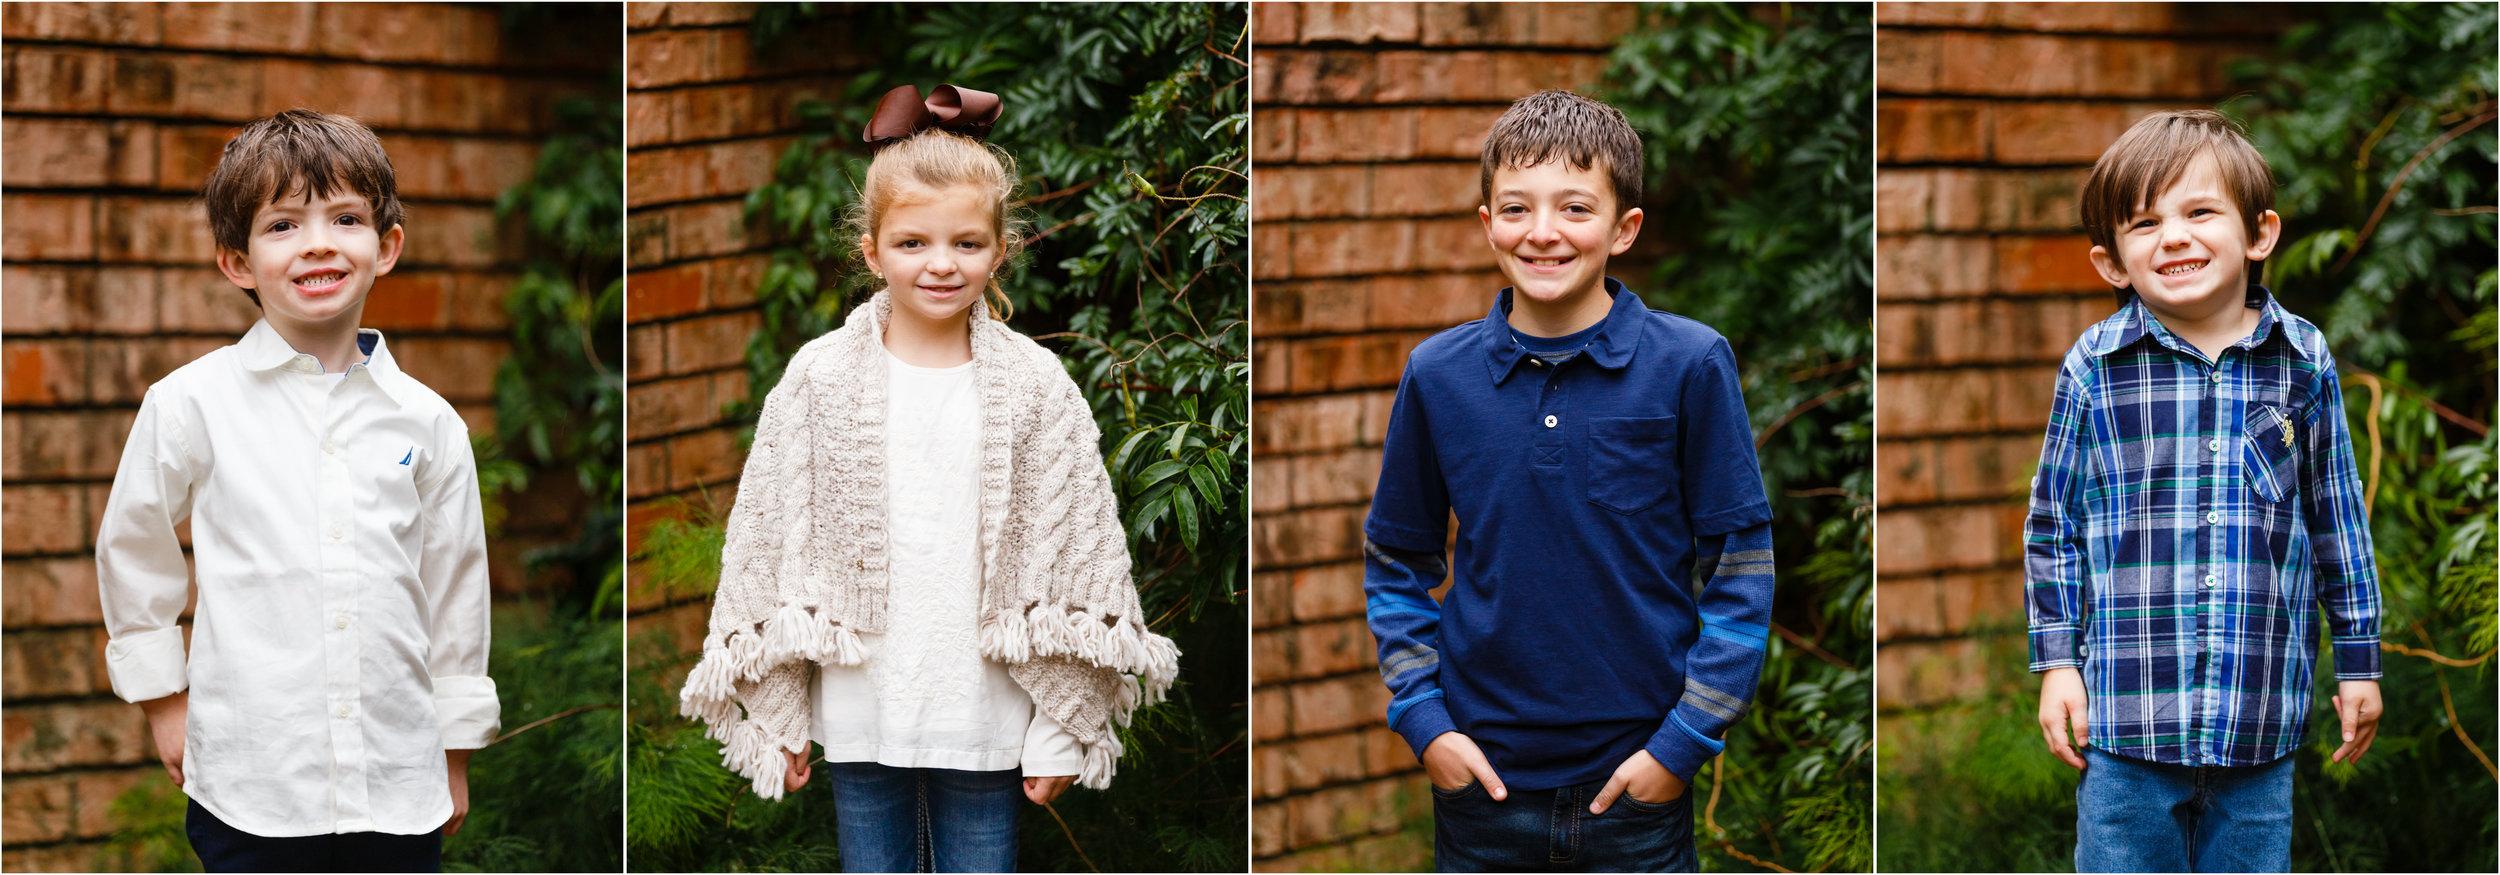 Family-child-portrait-lafayette-broussard-youngsville-photographer-c.jpg